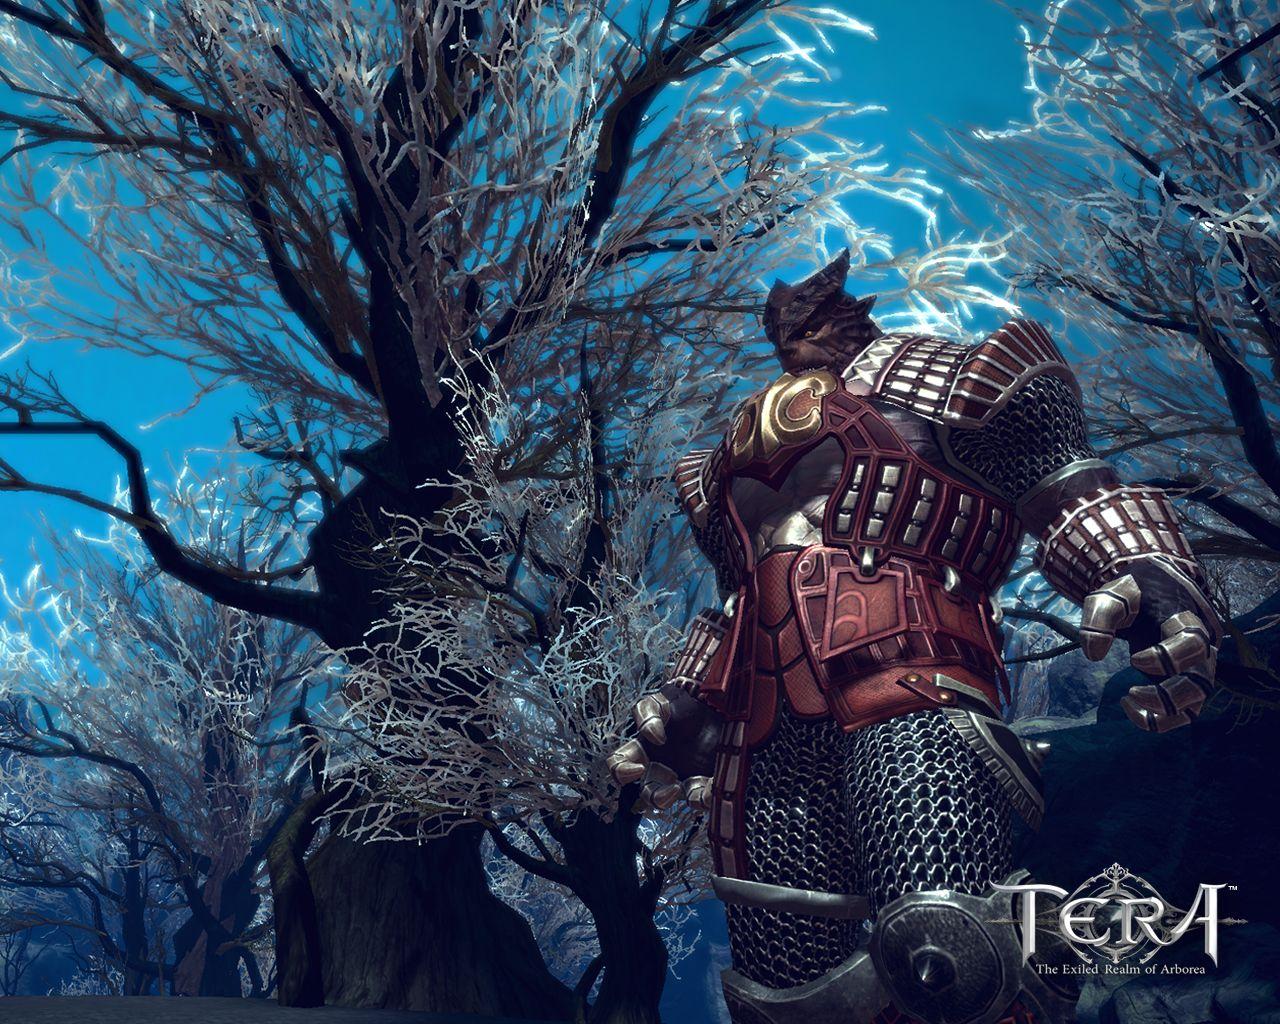 Fond dcran TERA The Exiled Realm Of Arborea   1280x1024 1280x1024